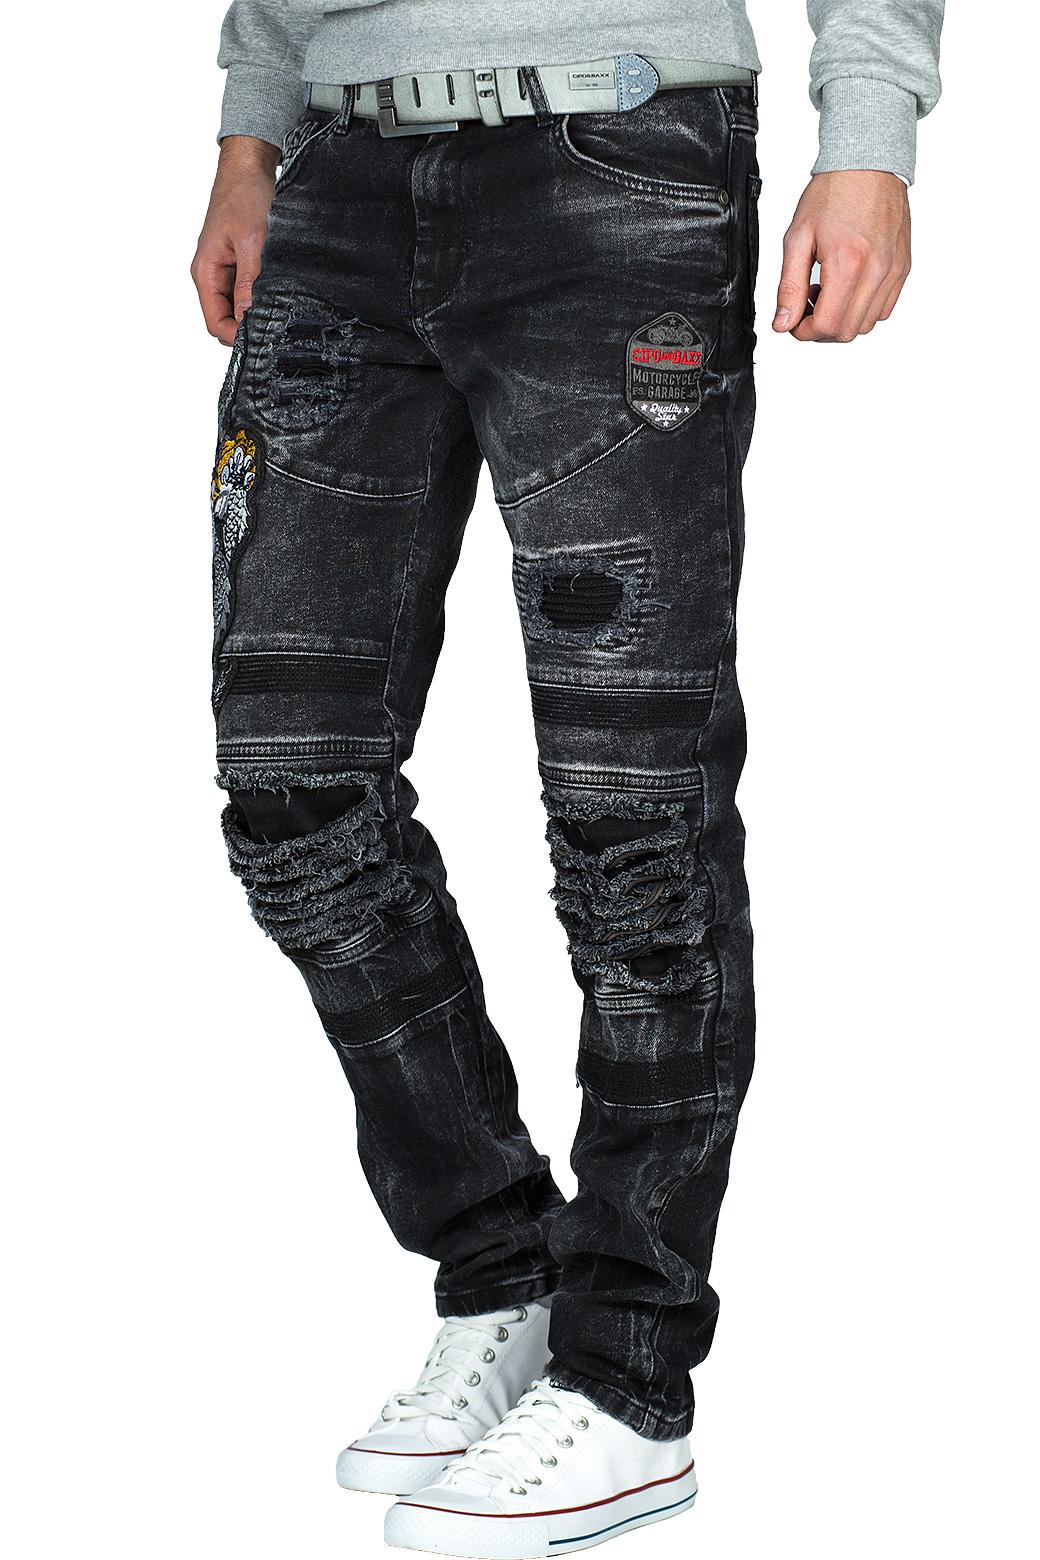 Cipo-amp-Baxx-Uomo-Jeans-Pantaloni-ricamate-Biker-Style-streetwear-nervature-pattern-Dope miniatura 5